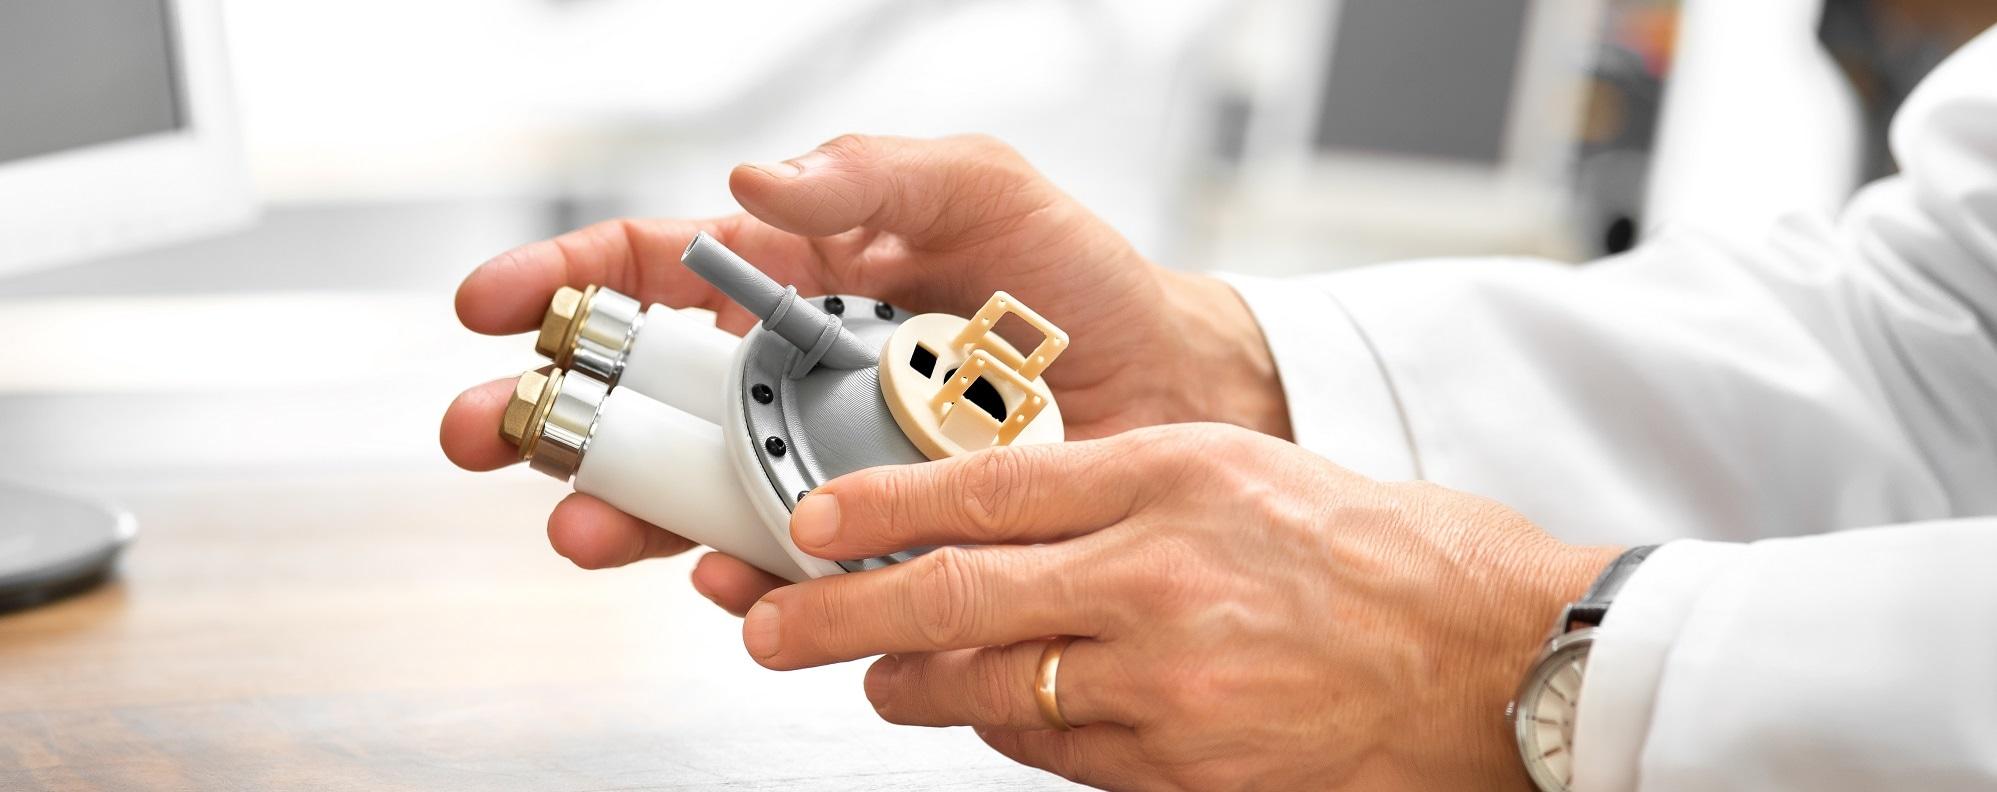 3D Printing – Constructing an Artificial 3D Heart Using the Zortrax M200